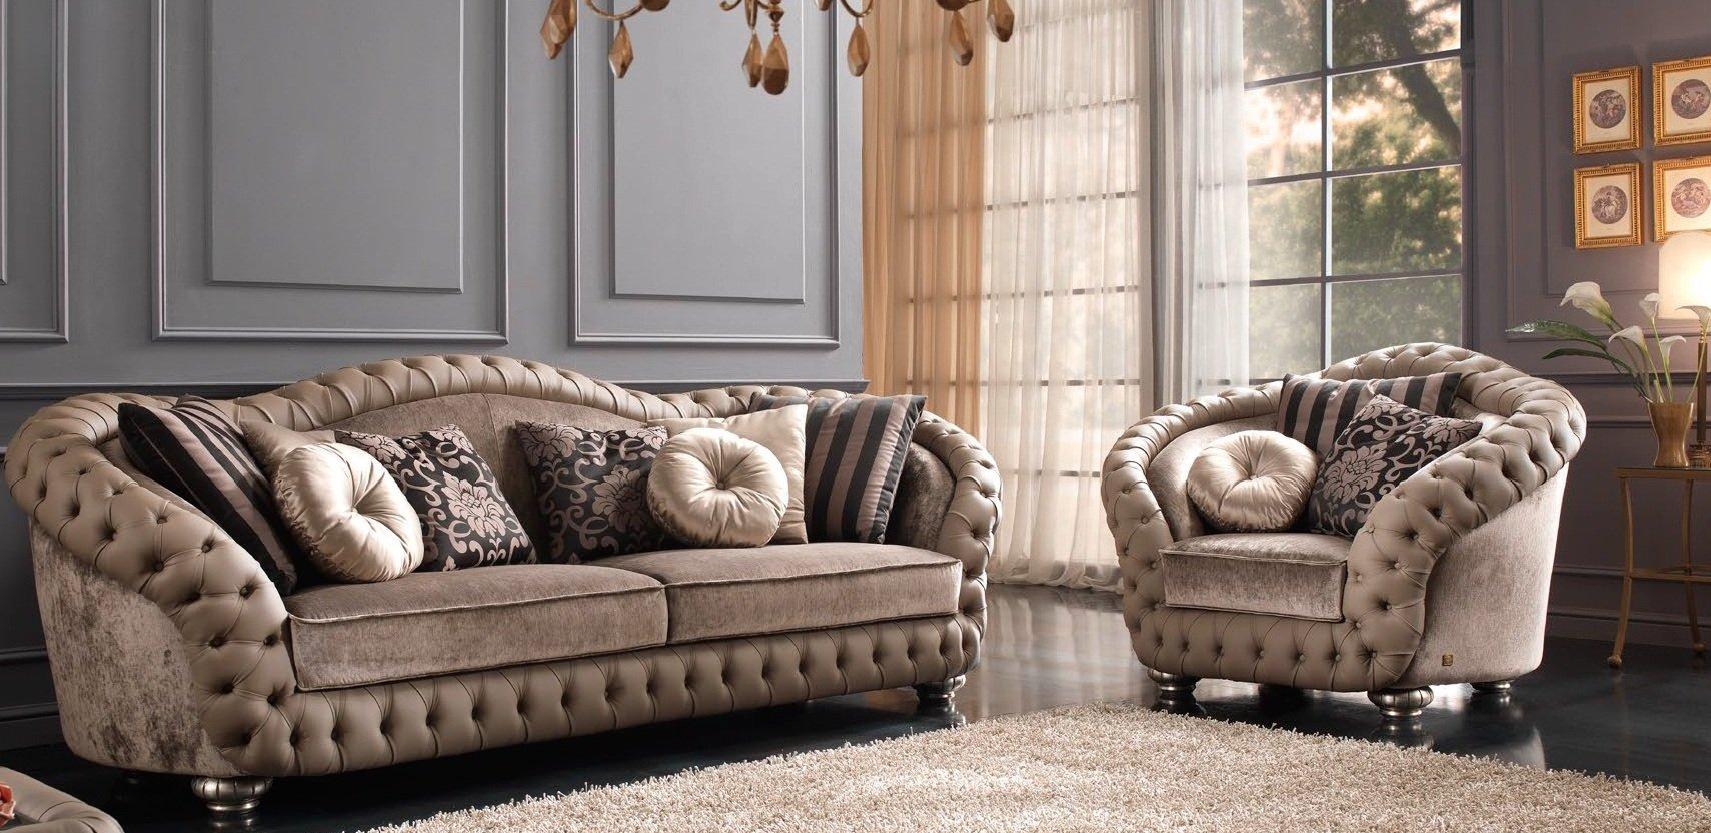 ADMIRAL комплект мягкой мебели 115048